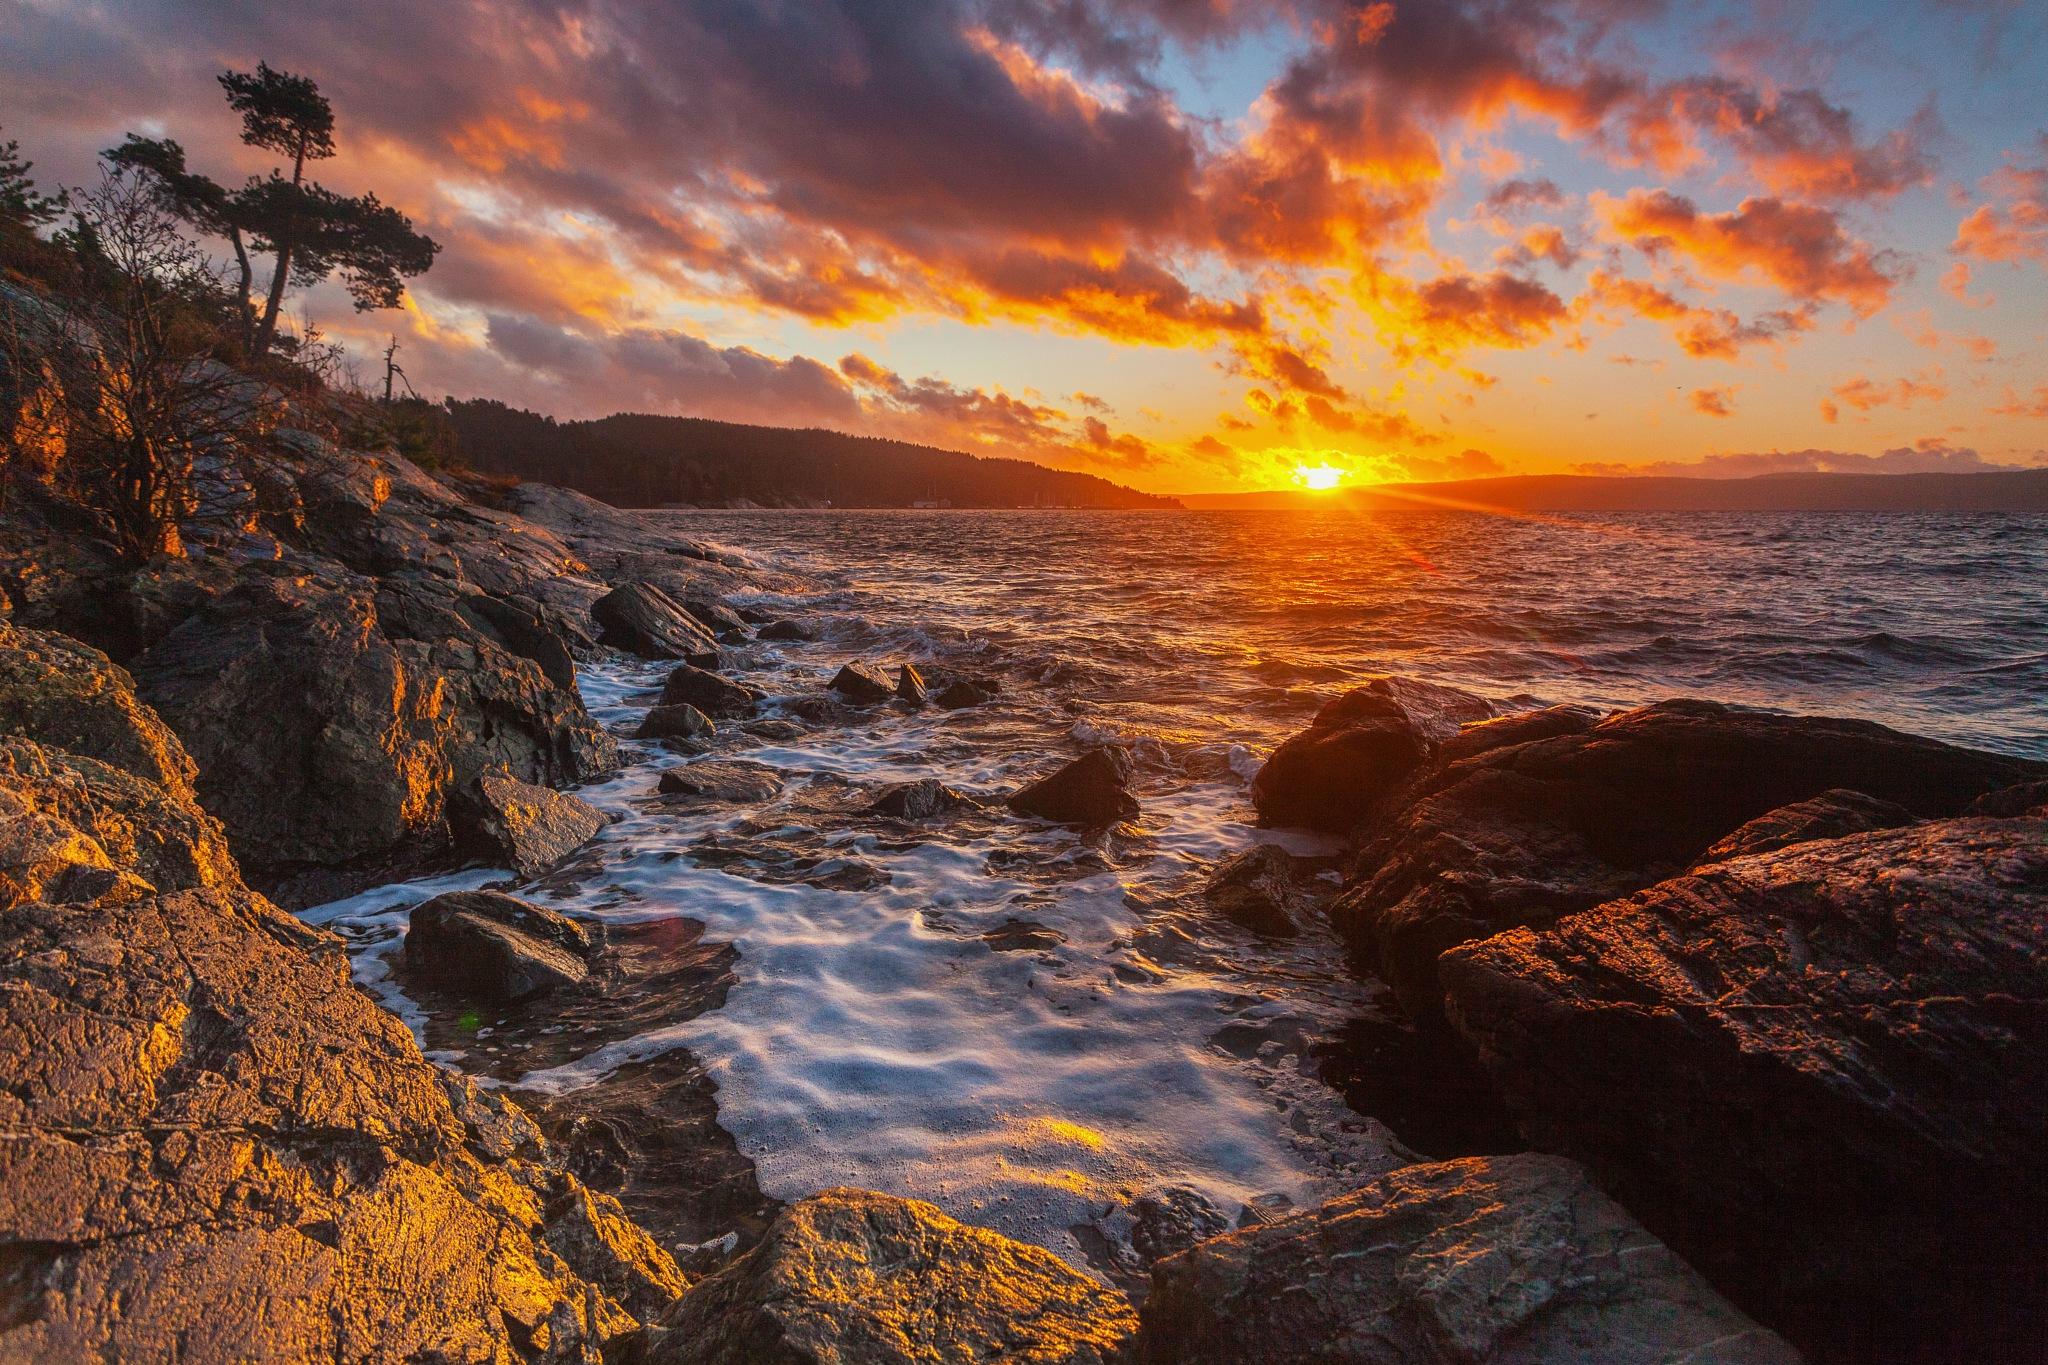 Windy sunset by Benjamin Zocholl